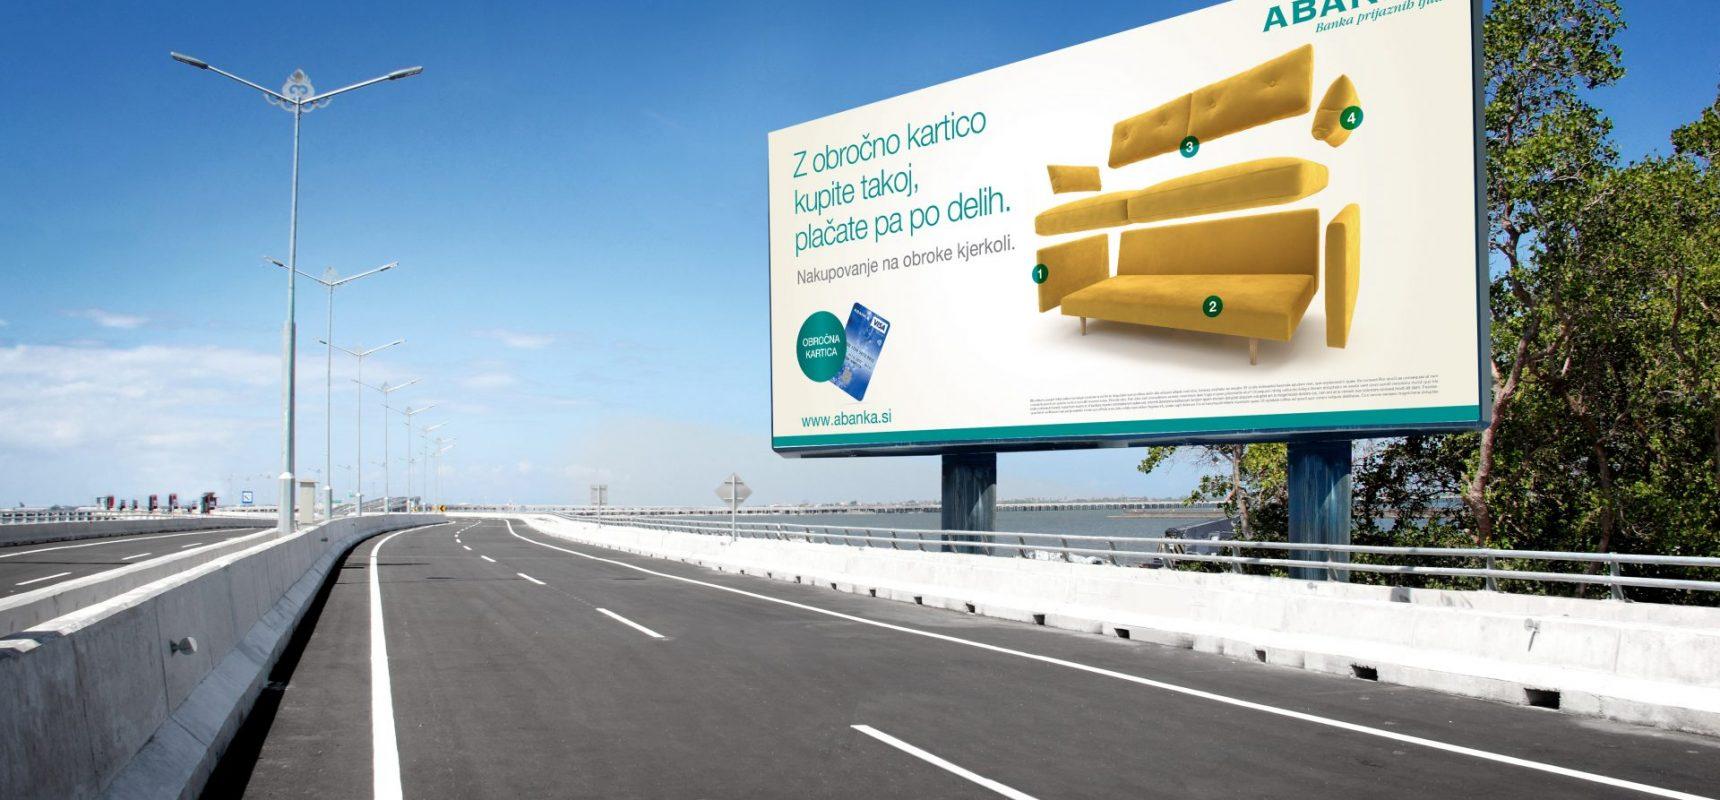 abanka_billboard_2